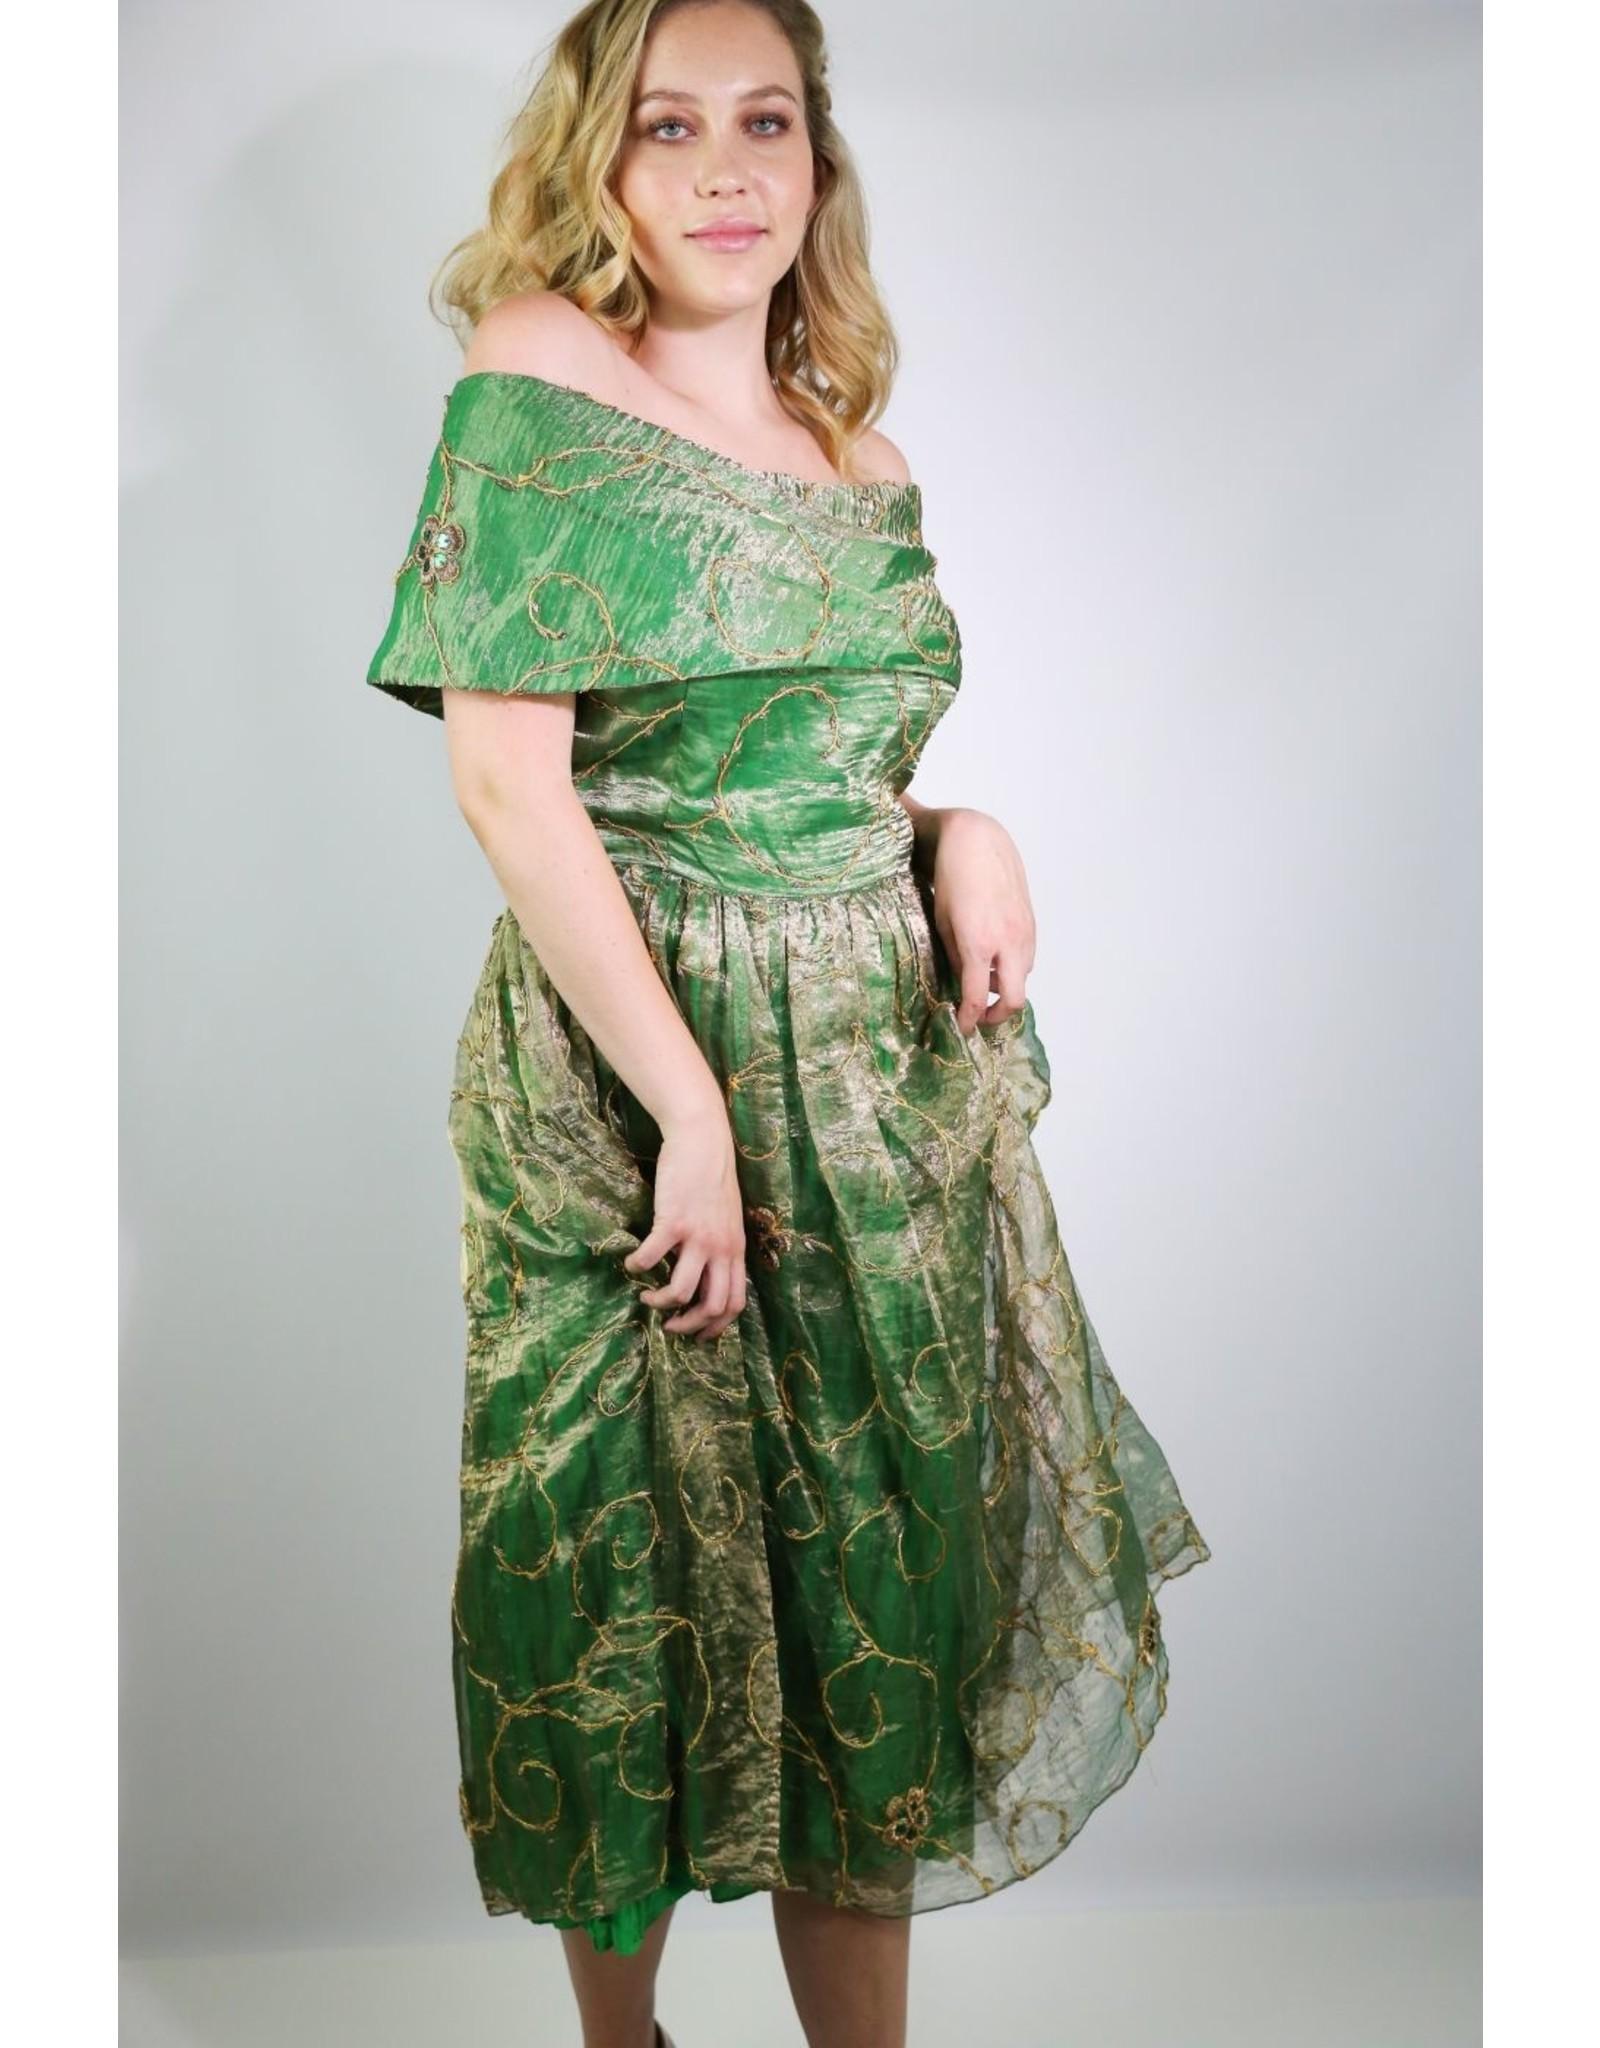 1970's Renaissance Revival Green & Gold Gown